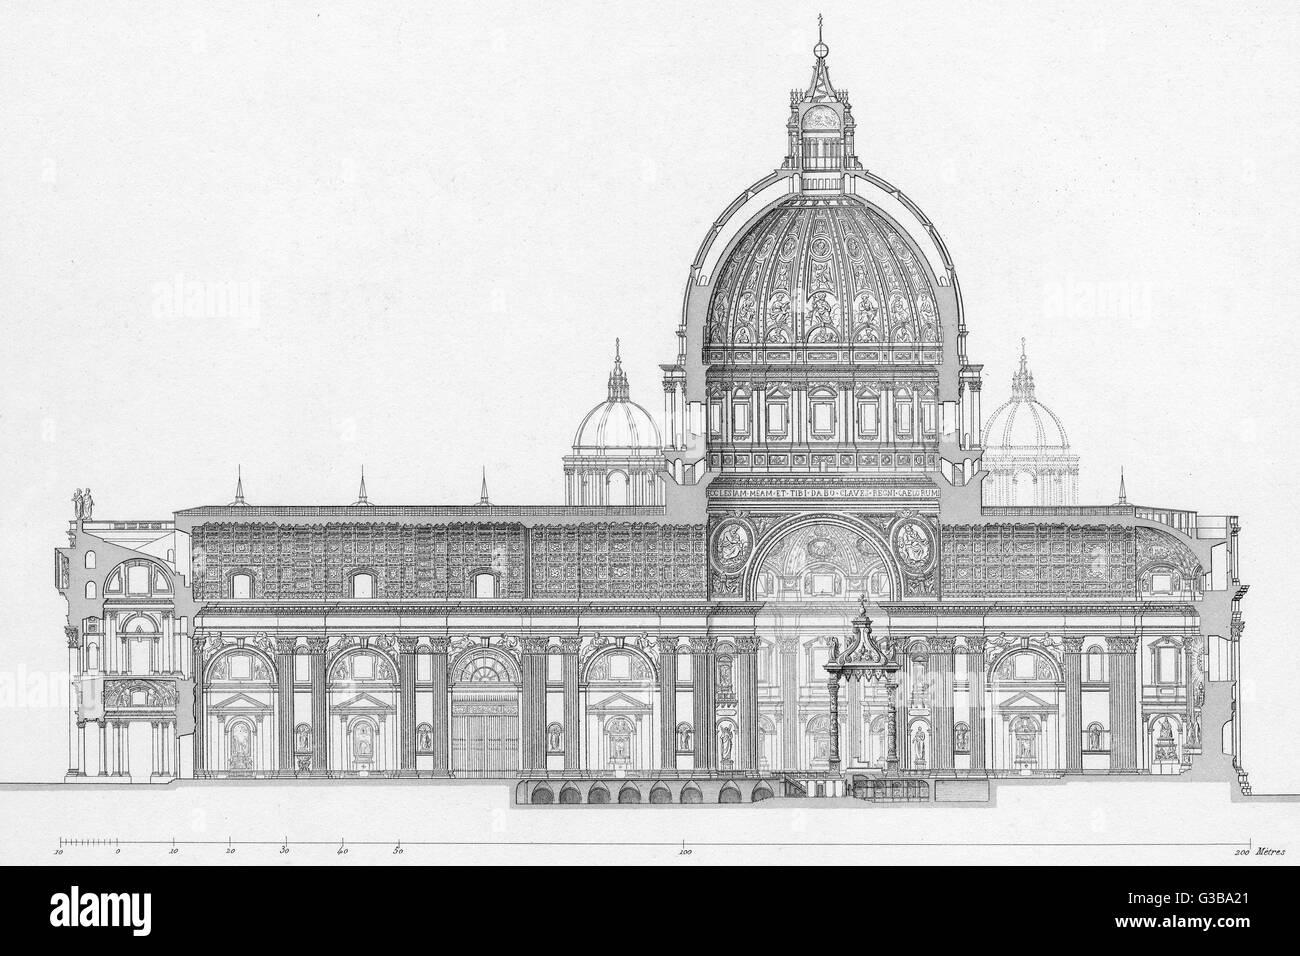 A longitudinal cut-through  view of the Basilica di San  Pietro in the Vatican, Rome.        Date: 1855 Stock Photo